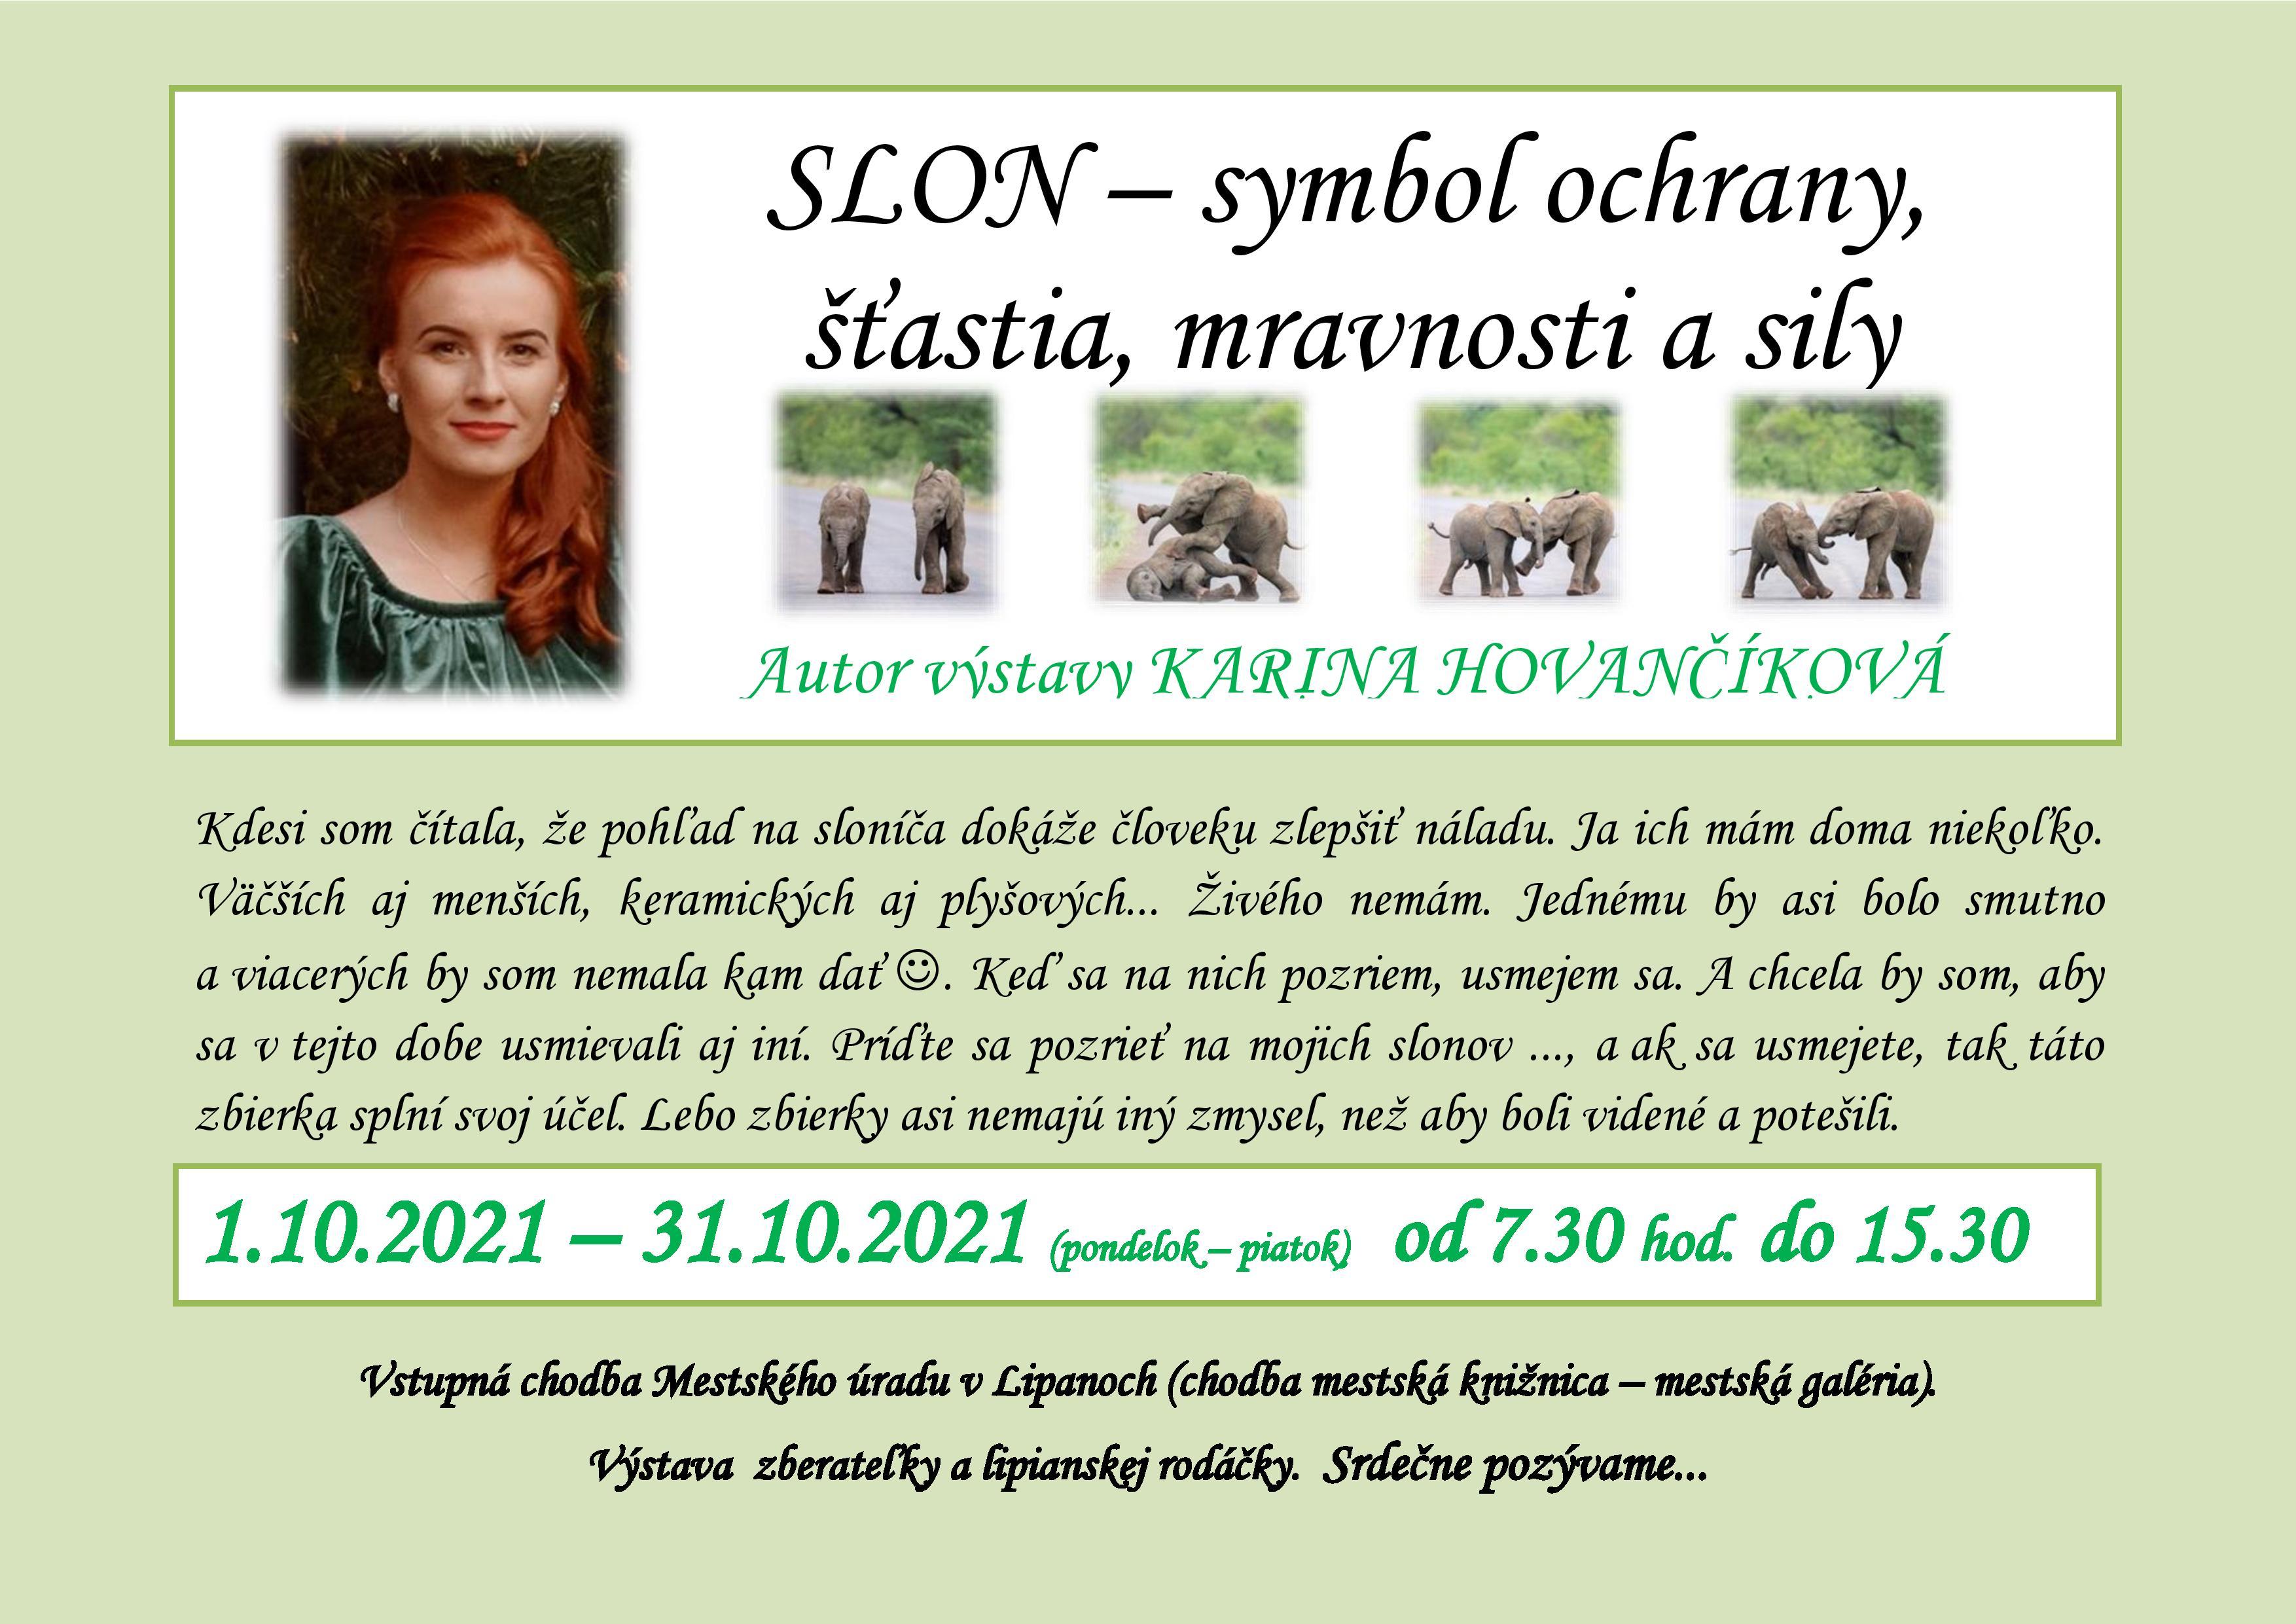 Slon_-_výstava_Karina_Hovančíková_-_október_2021-page-001